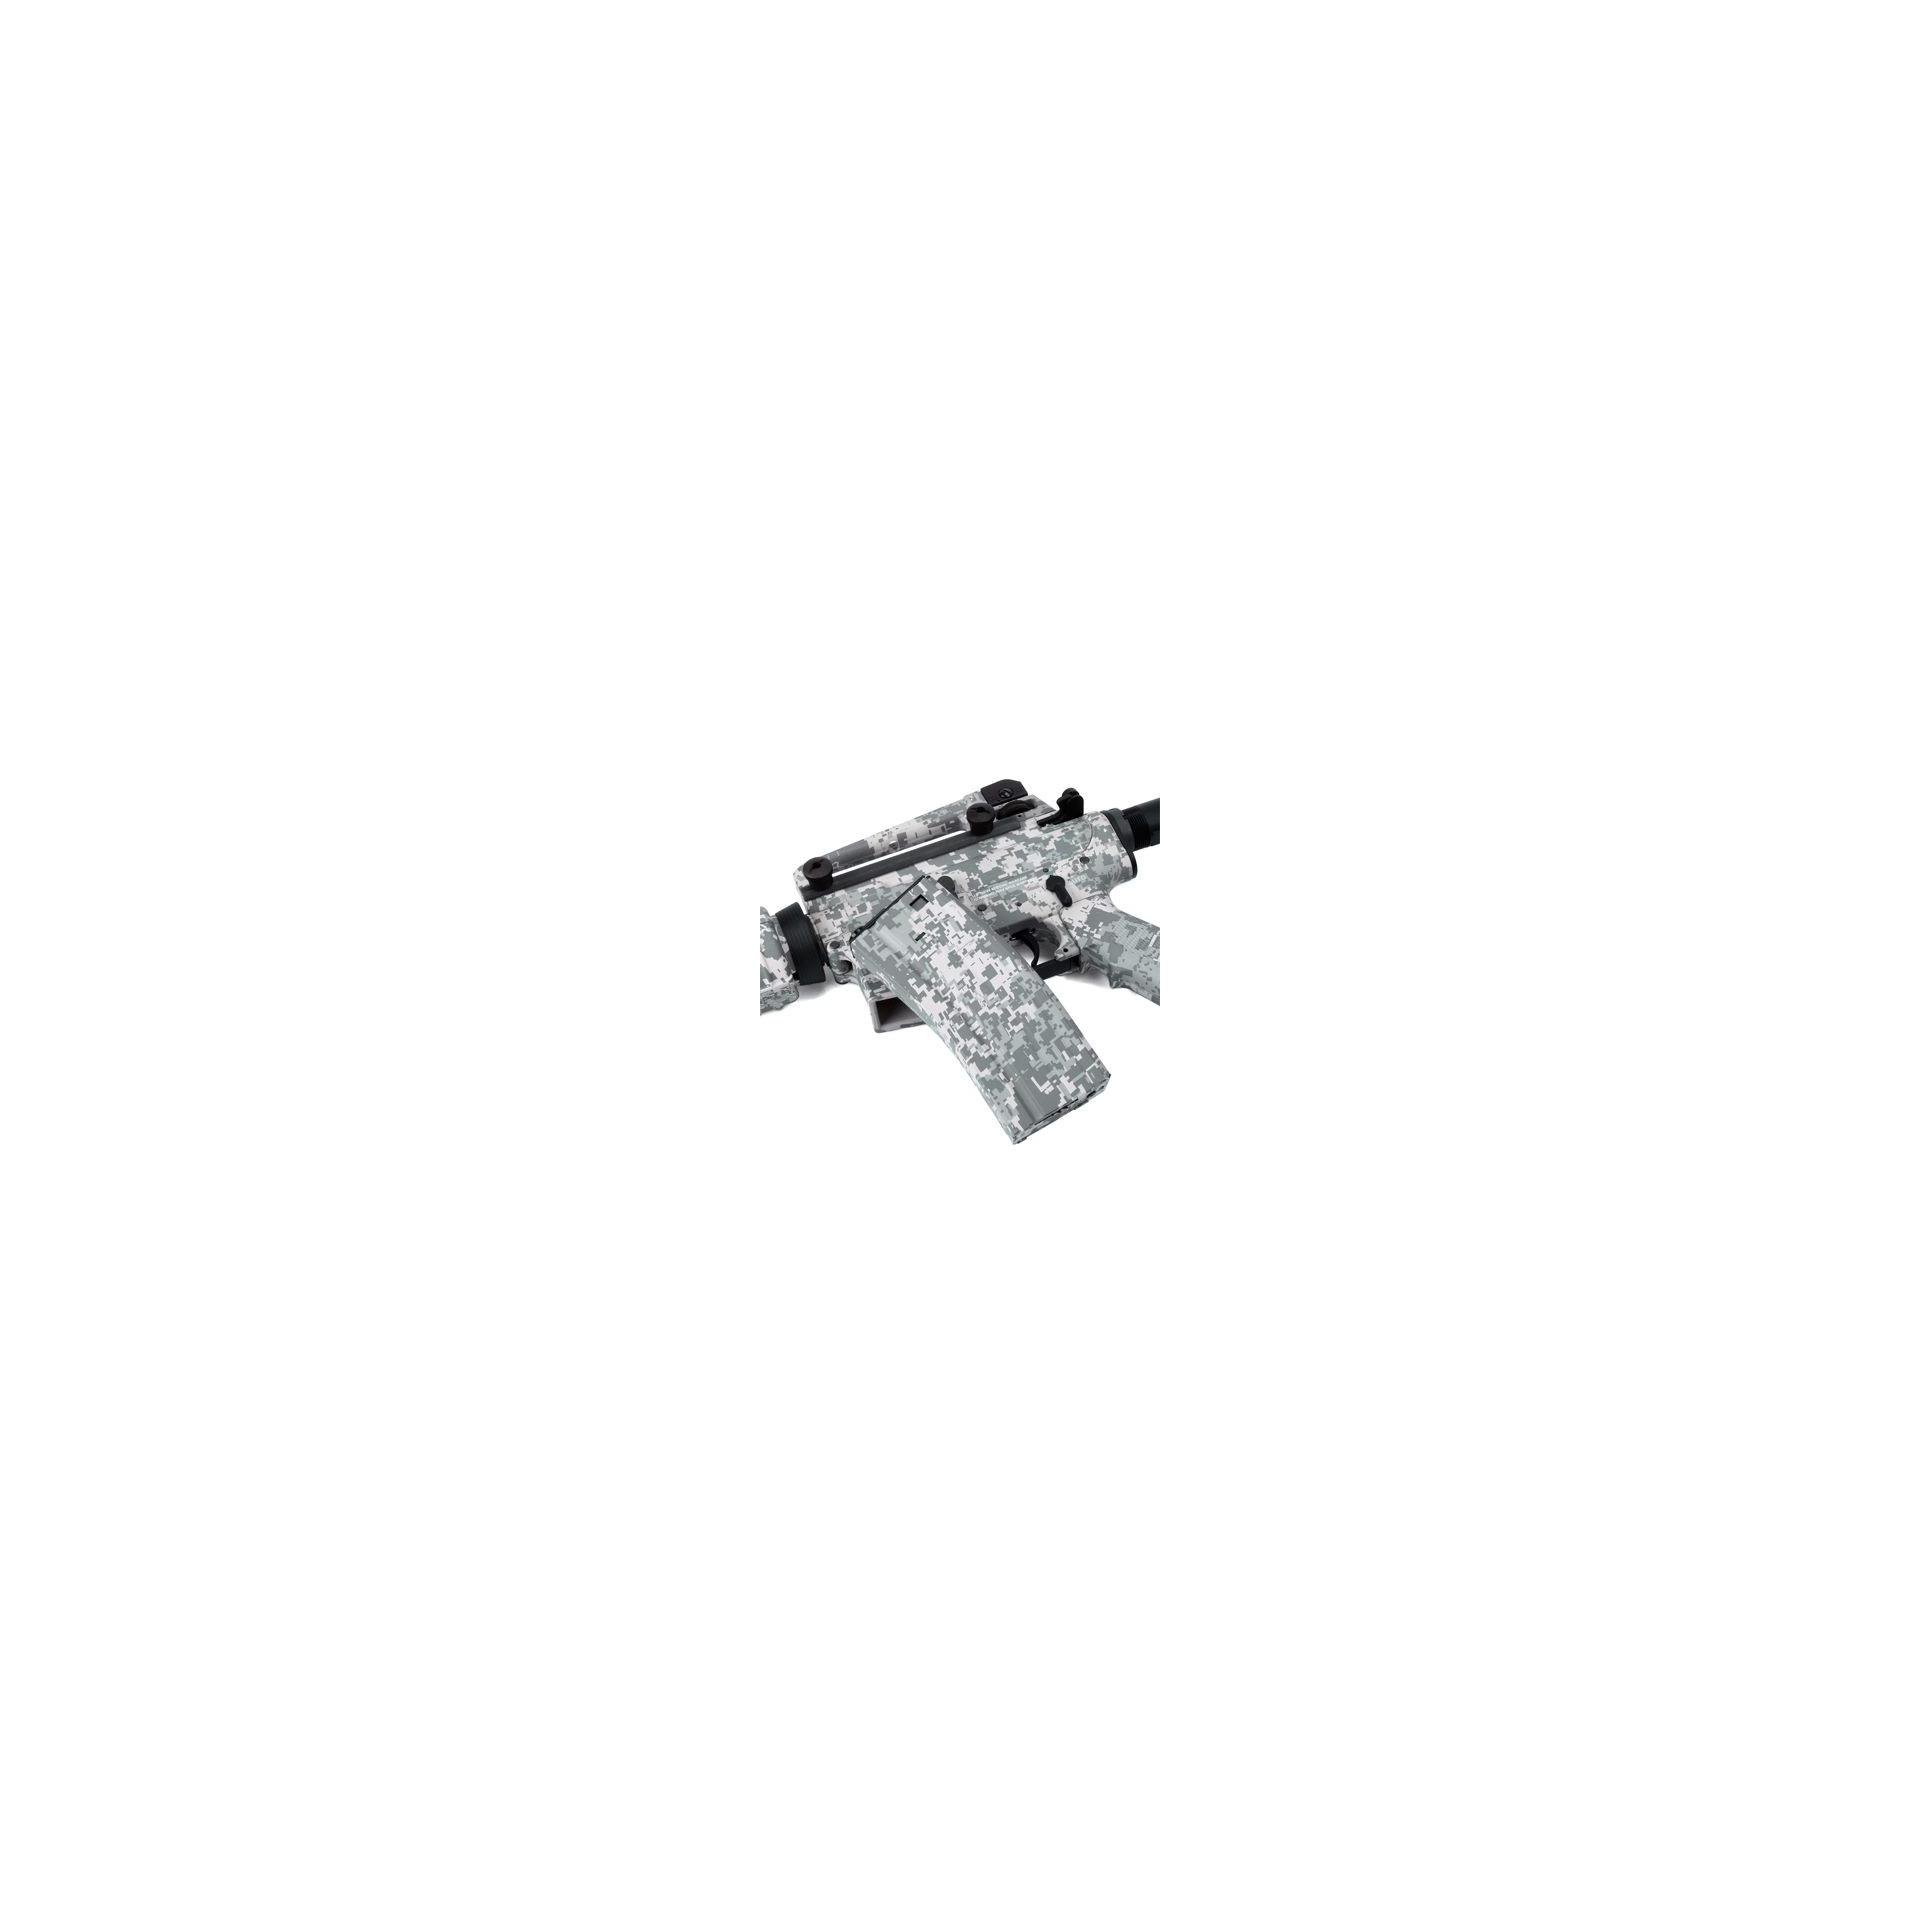 Rifle De Airsoft Navy Seals M4a1 Camuflado Urbana Full Metal Cal 6.0mm - King Arms